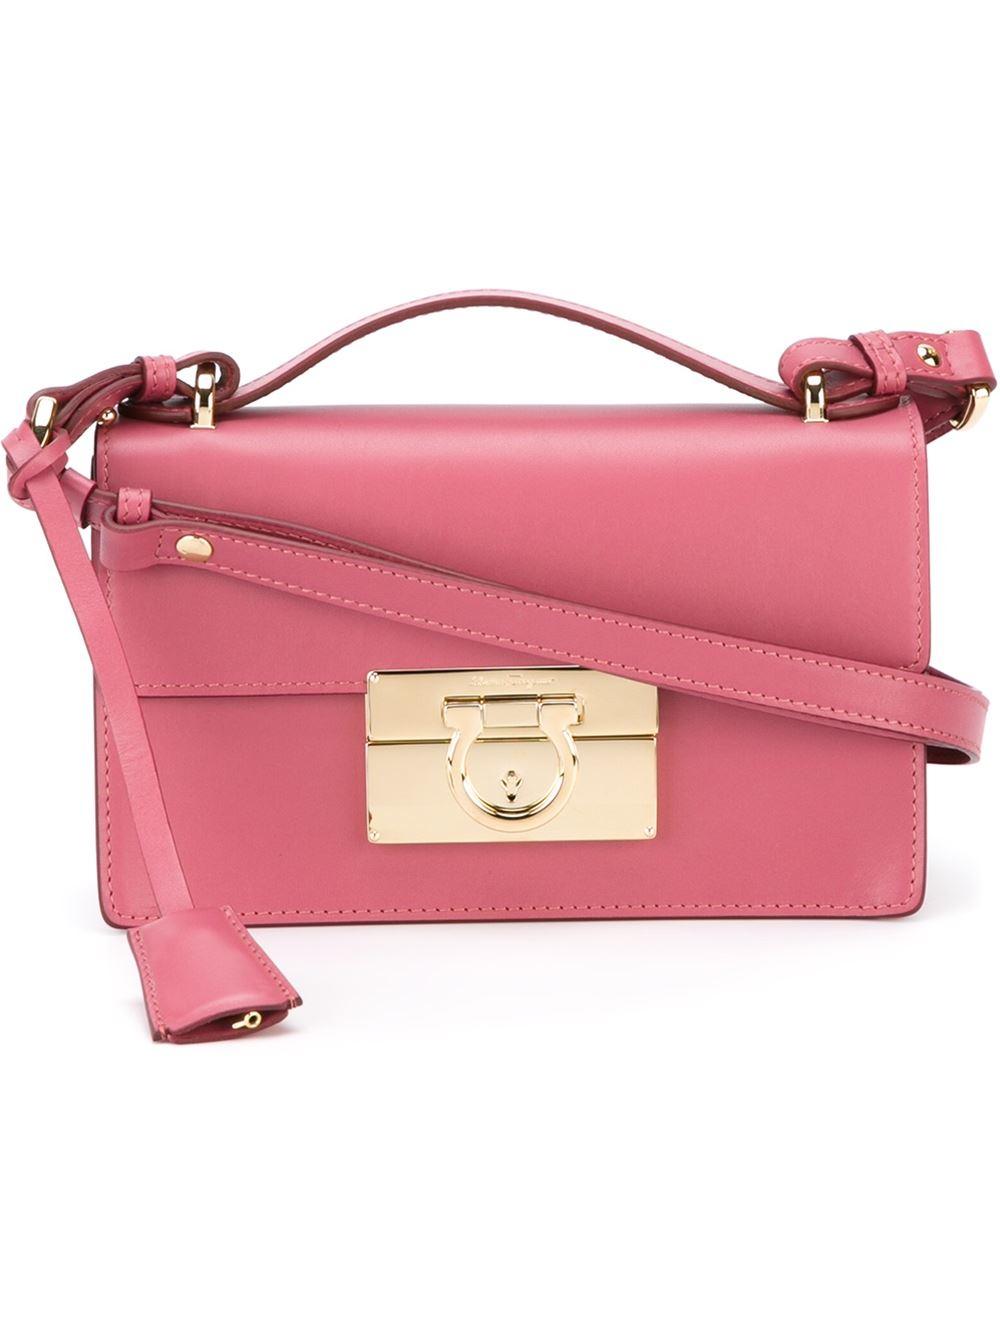 Ferragamo Aileen Shoulder Bag in Pink | Lyst